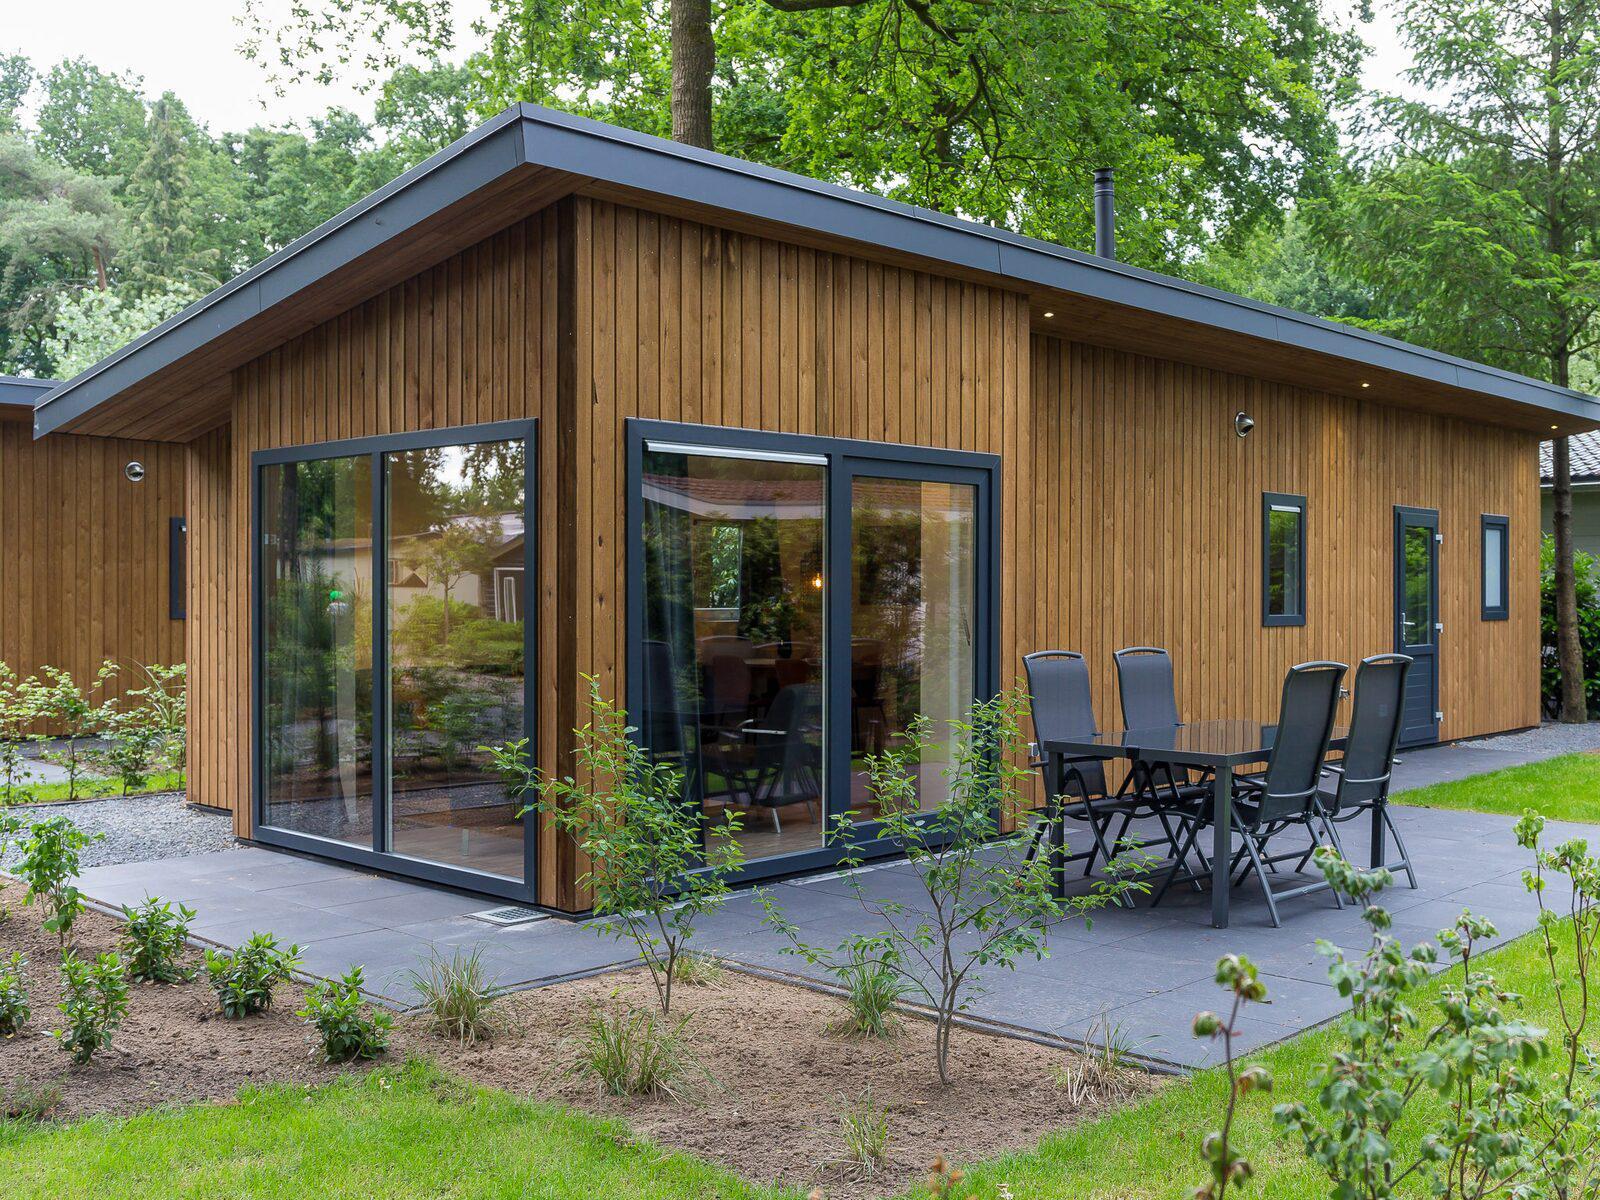 Wood Lodge Eco 4 personen Wellness